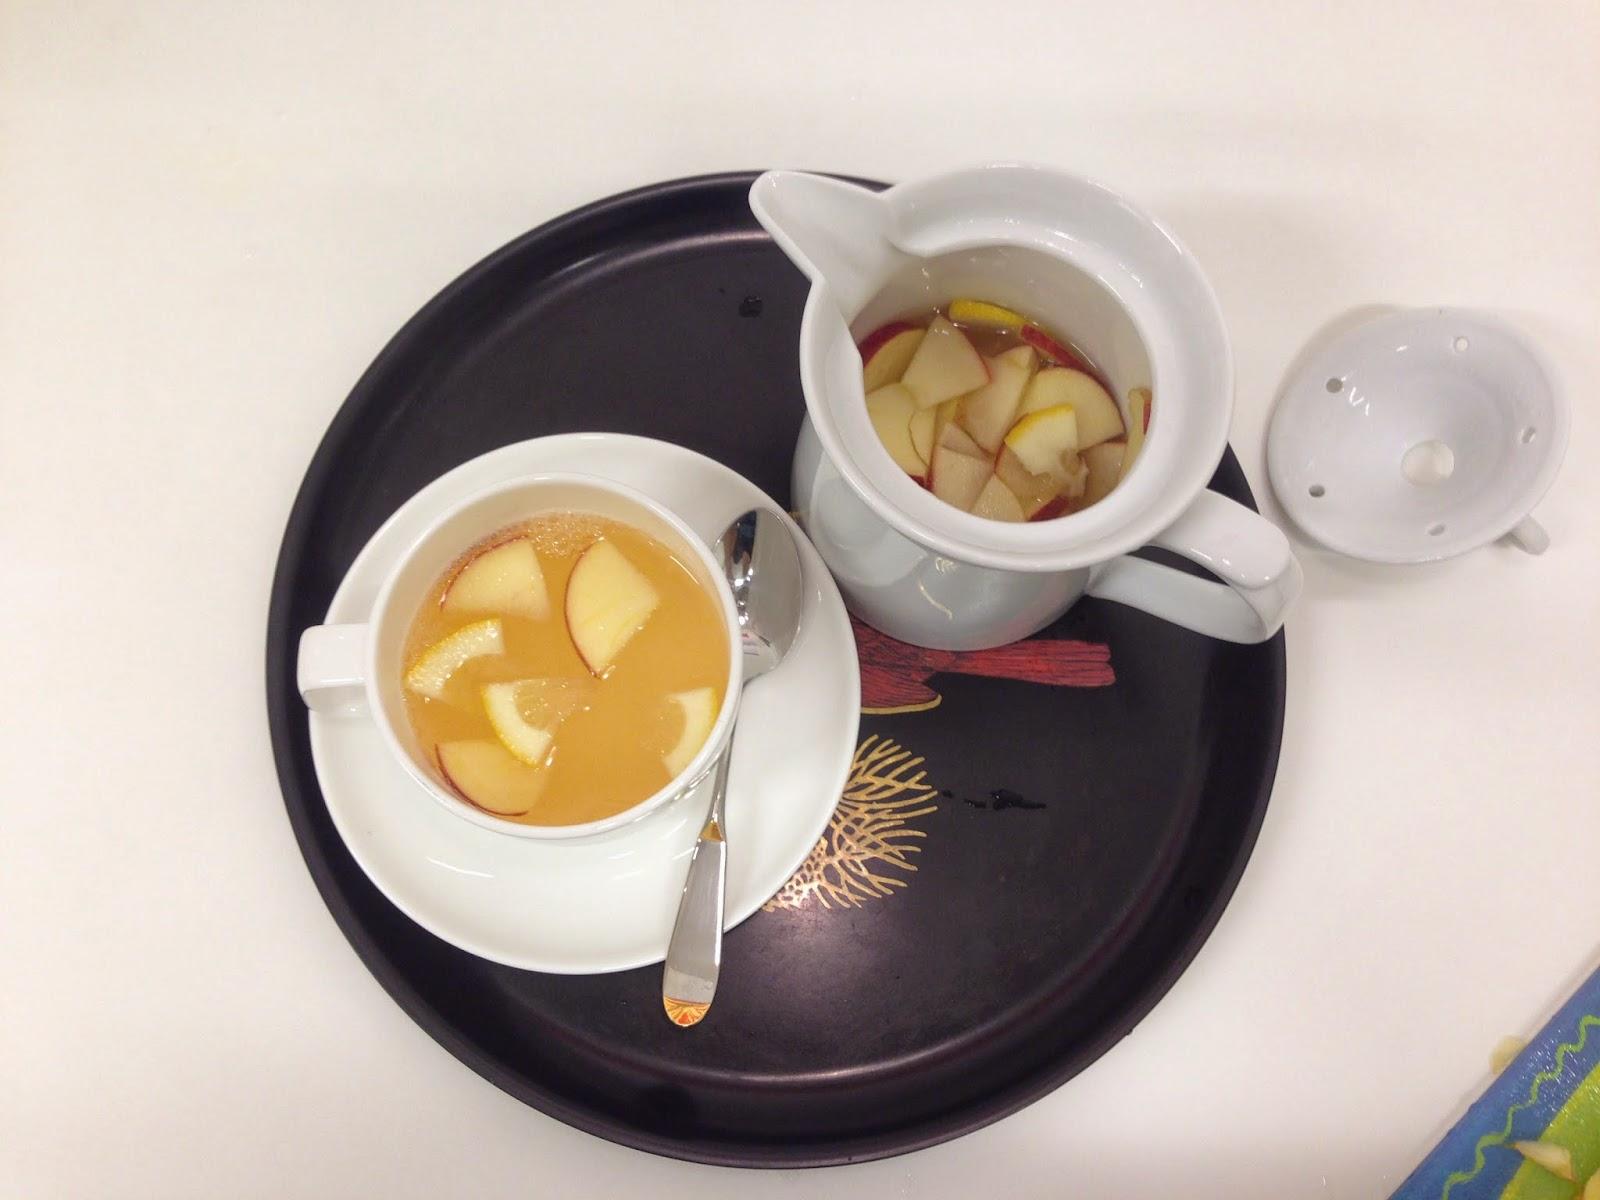 ... Dough: 7th Weekend - Beautiful Mess - Apple Lemon Tea in Korean Style